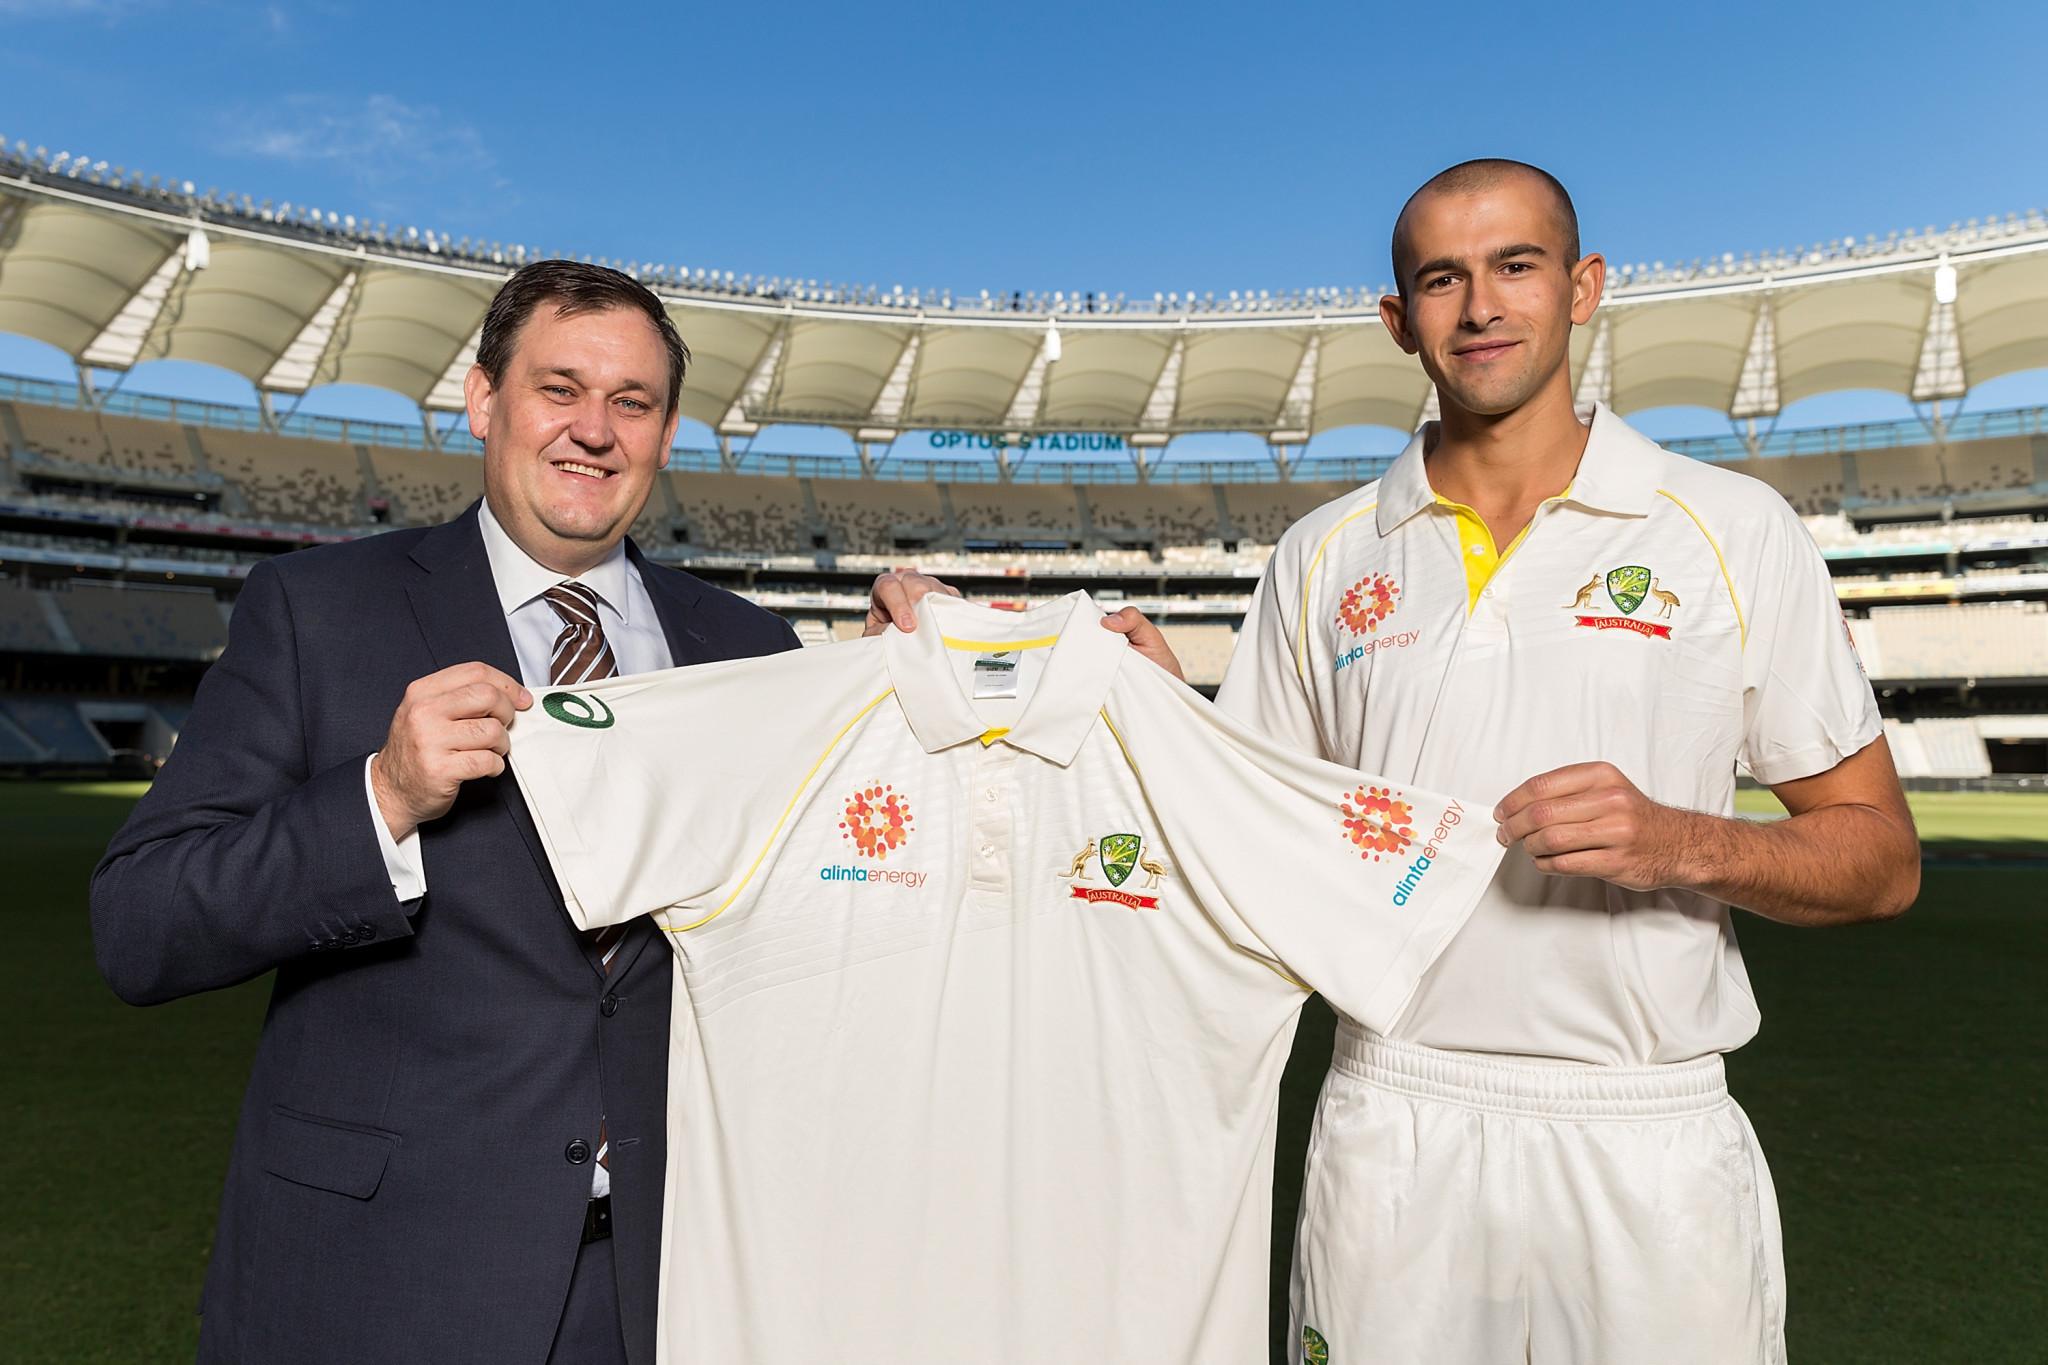 Cricket Australia announce Alinta Energy as shirt sponsor